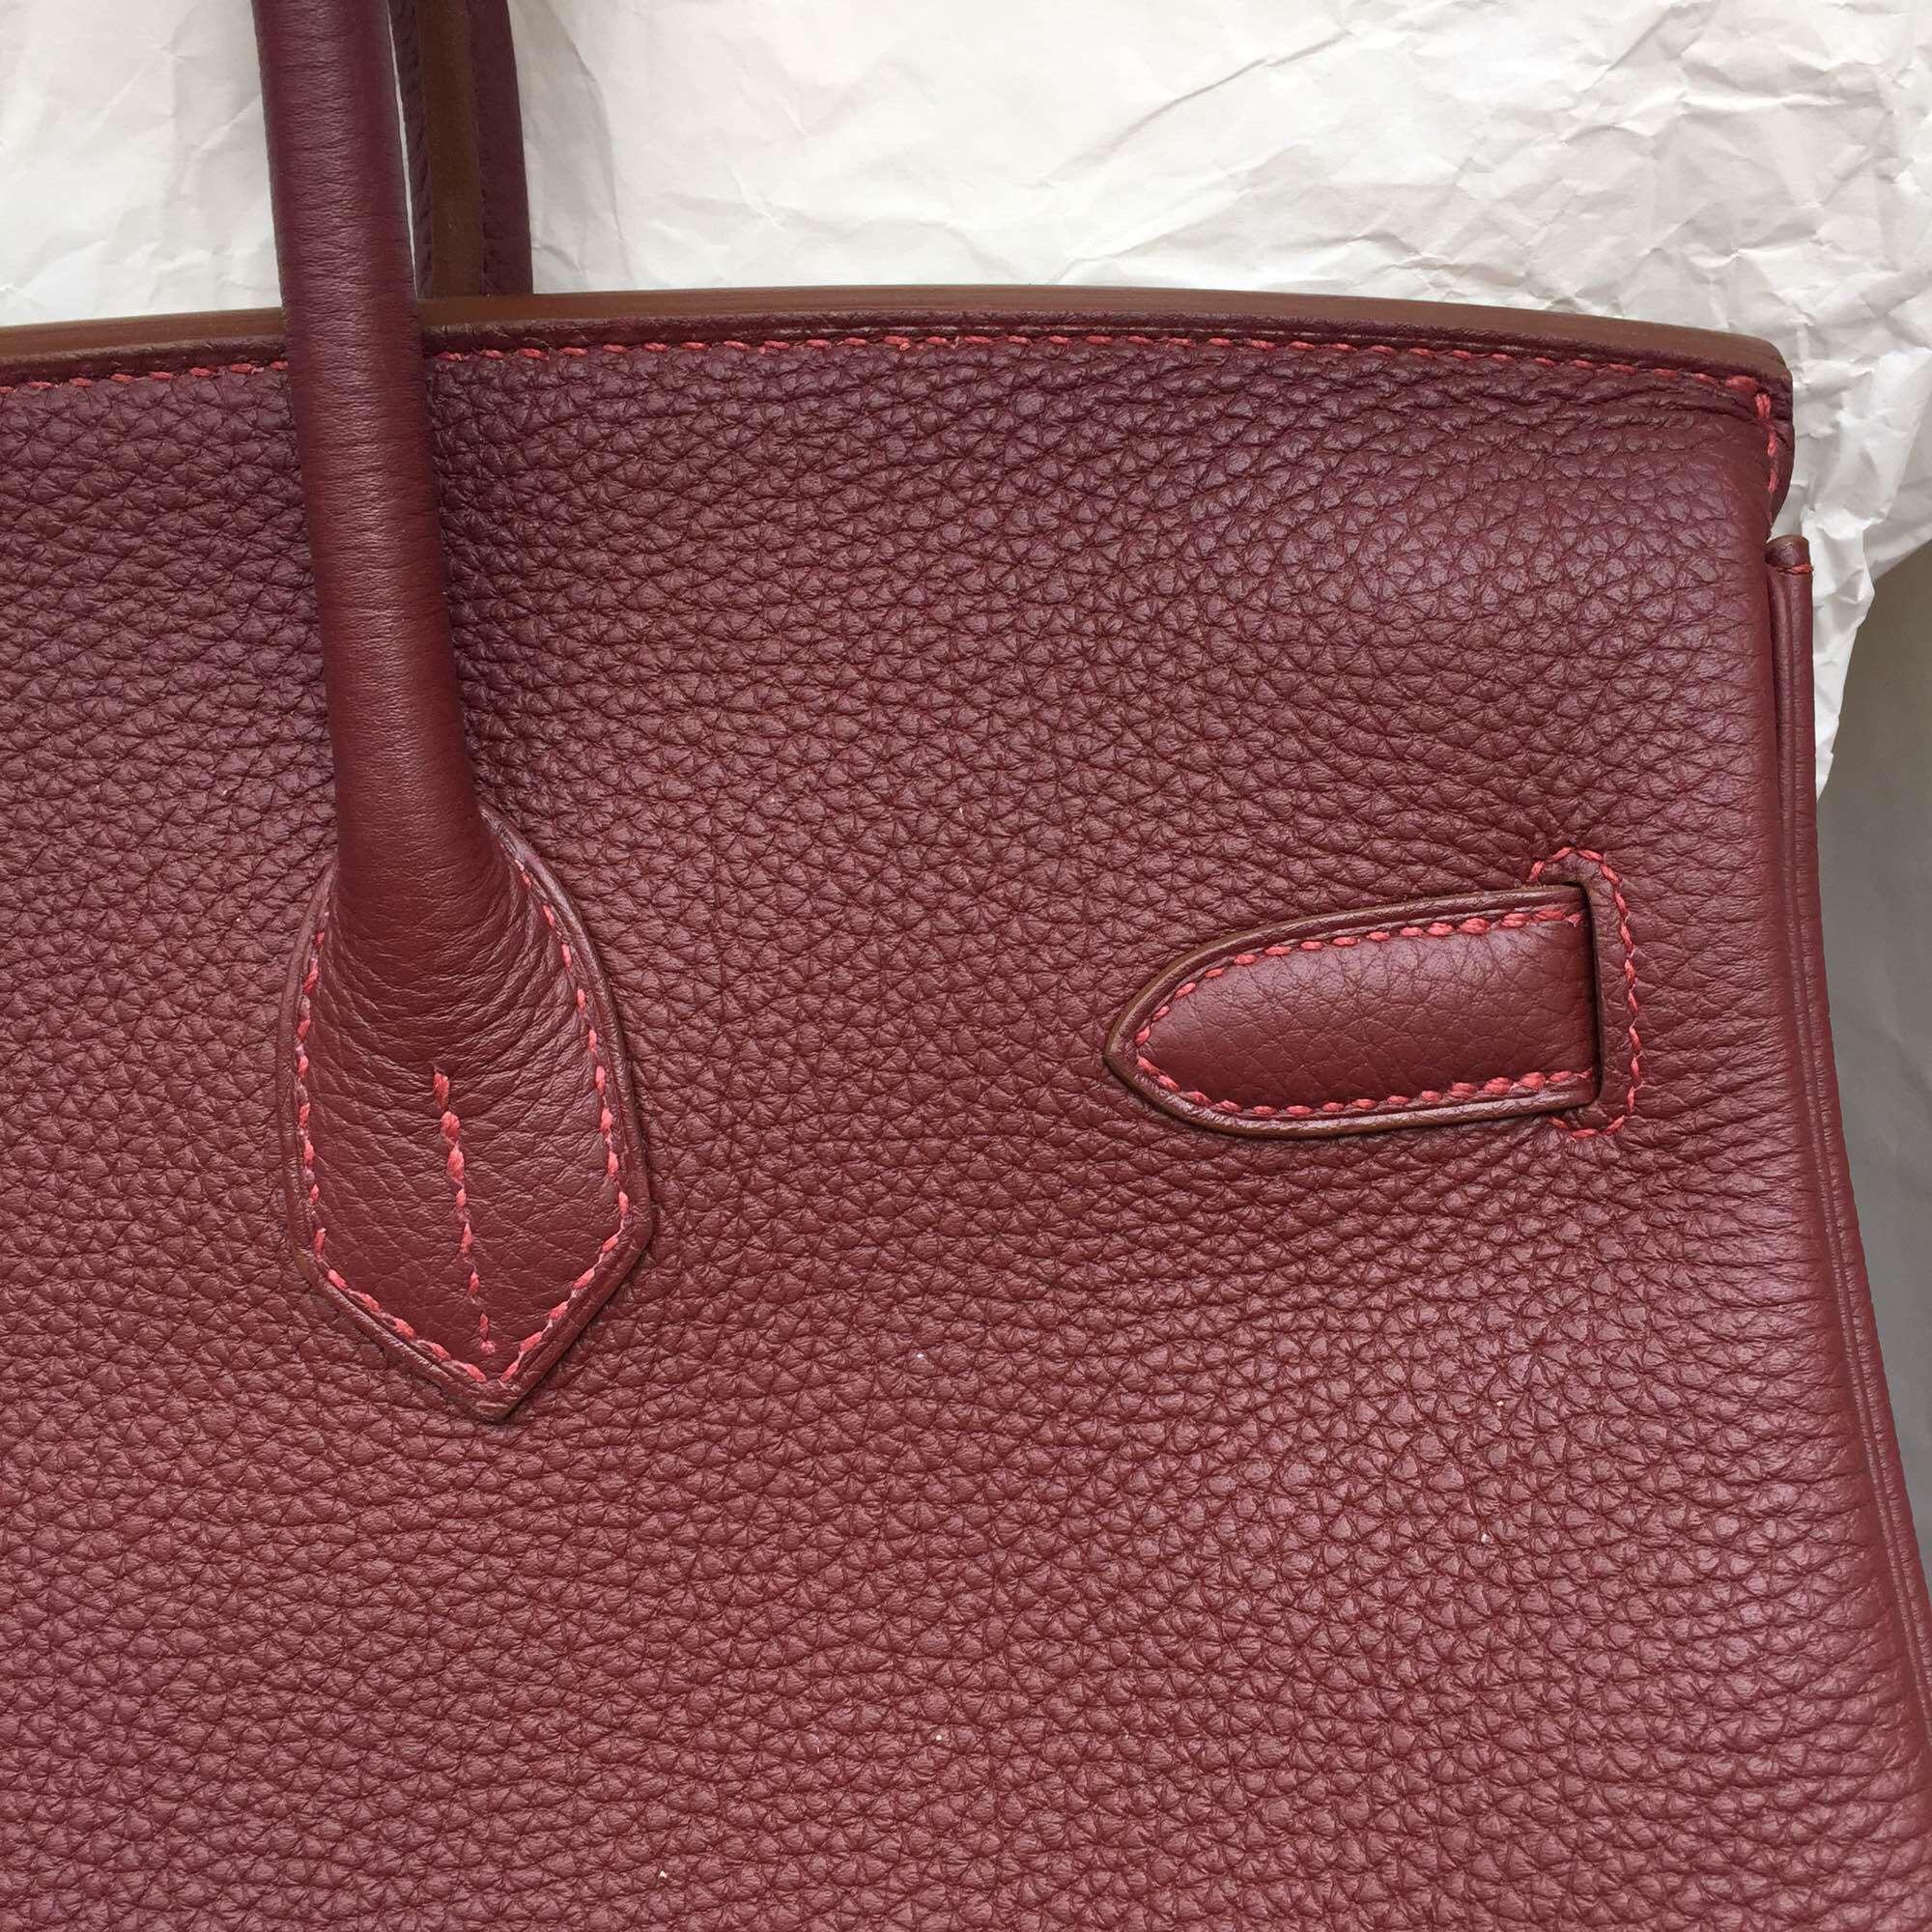 Hermes Birkin Bag 35CM B5 Ruby Red Togo Leather Women's Tote Bag Gold Hardware